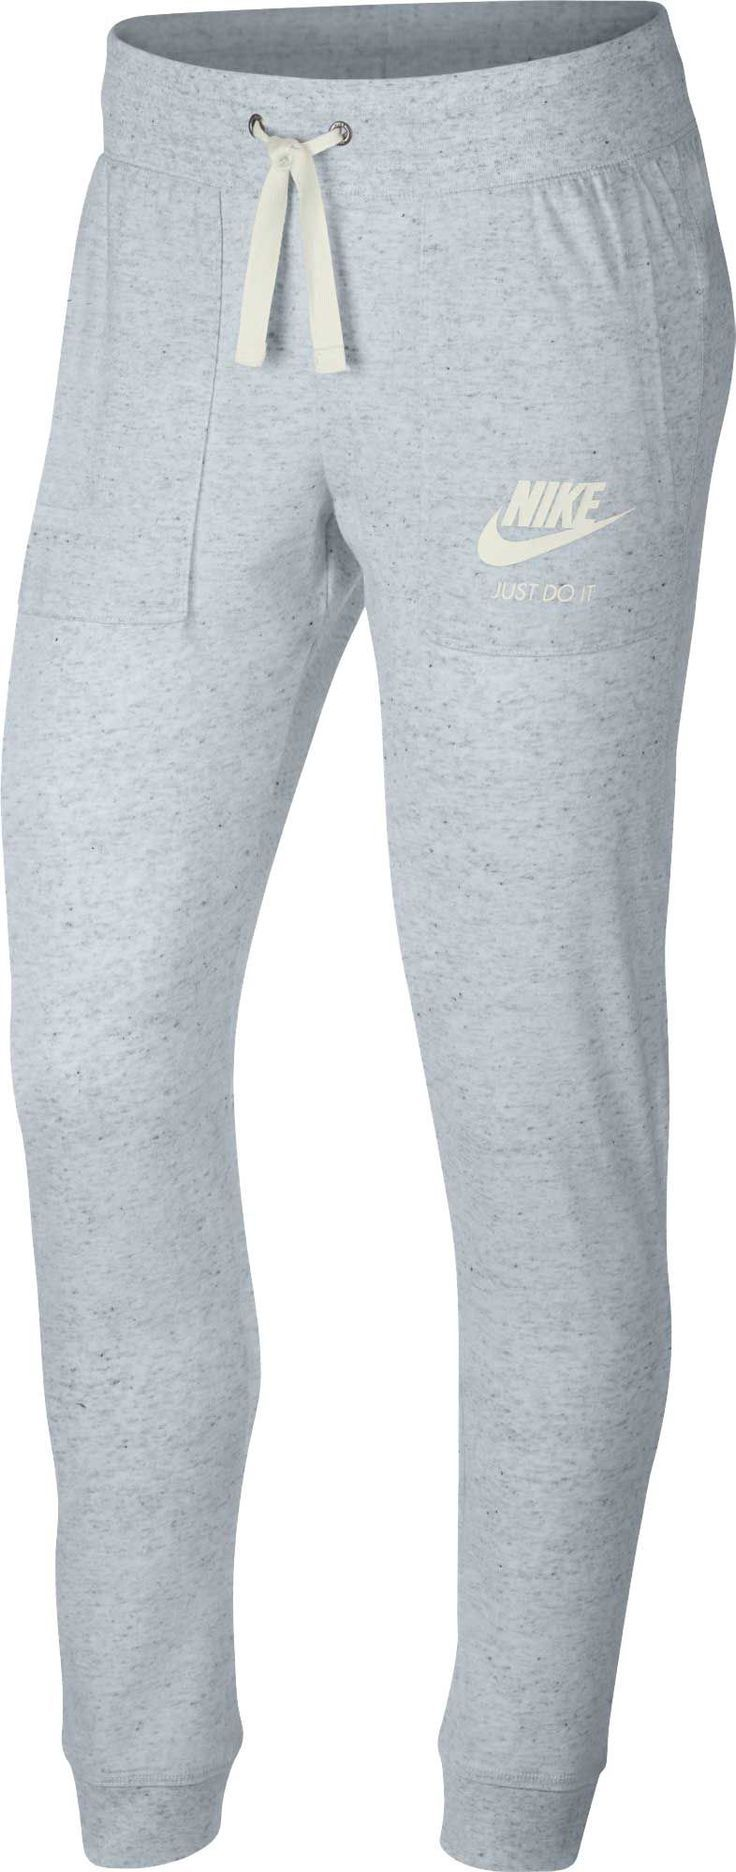 Pantalones Vintage Nike Sportswear Gym Para Mujer Talla Xs Gris Pantalones Vintage Ropa Ropa Deportiva